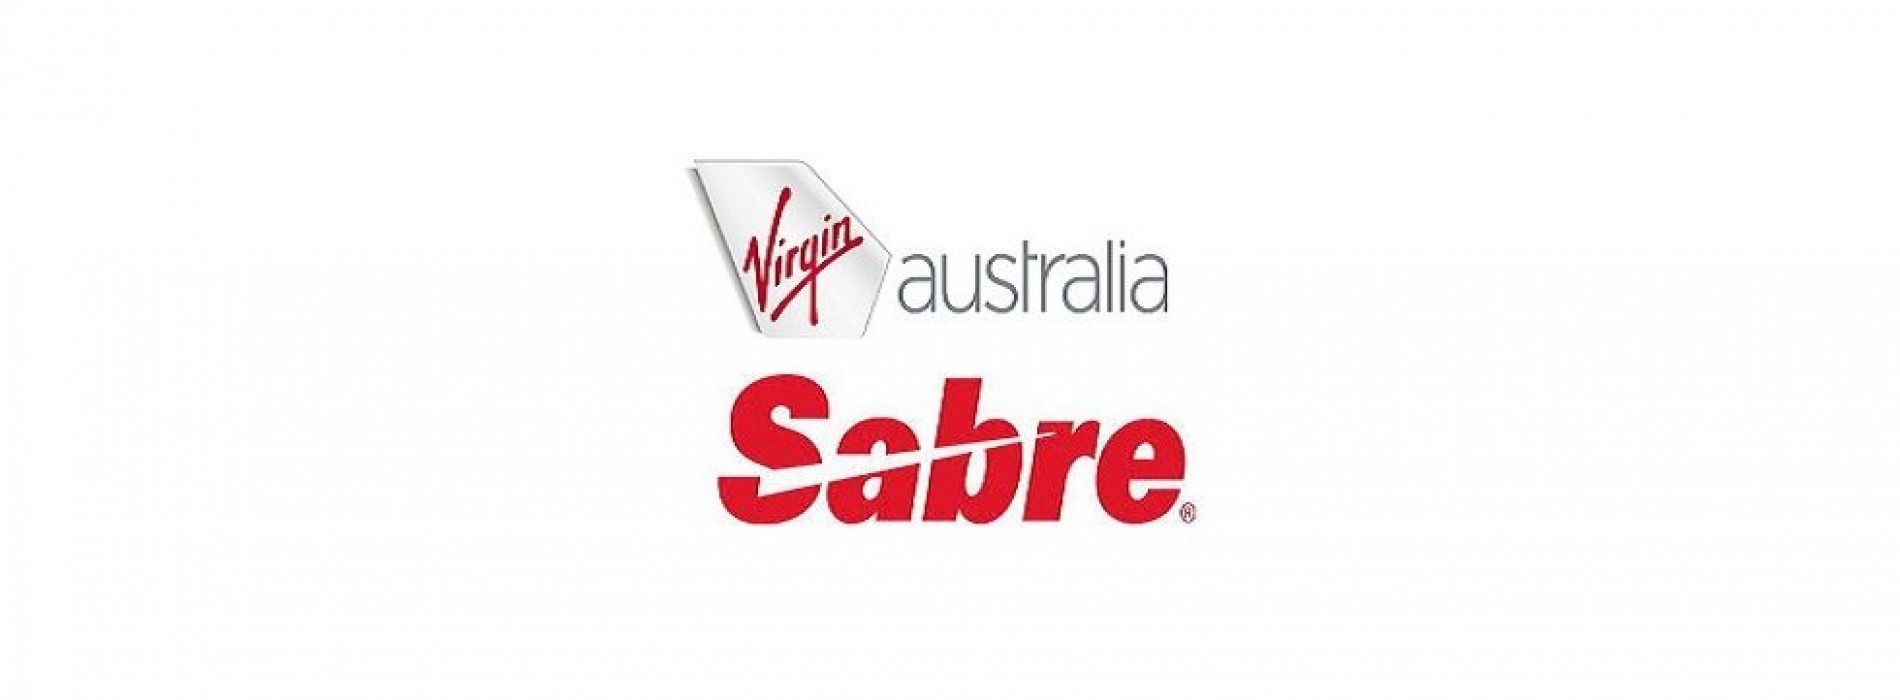 Virgin Australia implements Sabre Branded fares